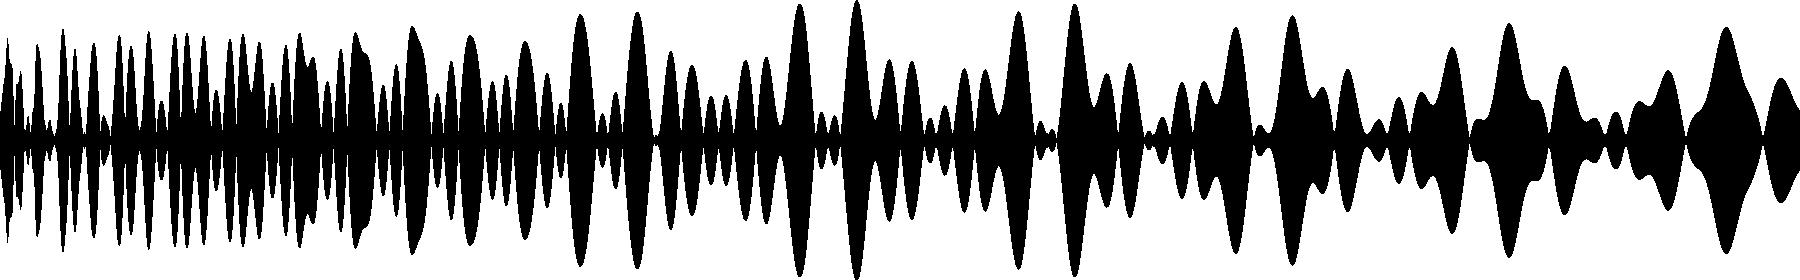 vedh bass cut 051 d